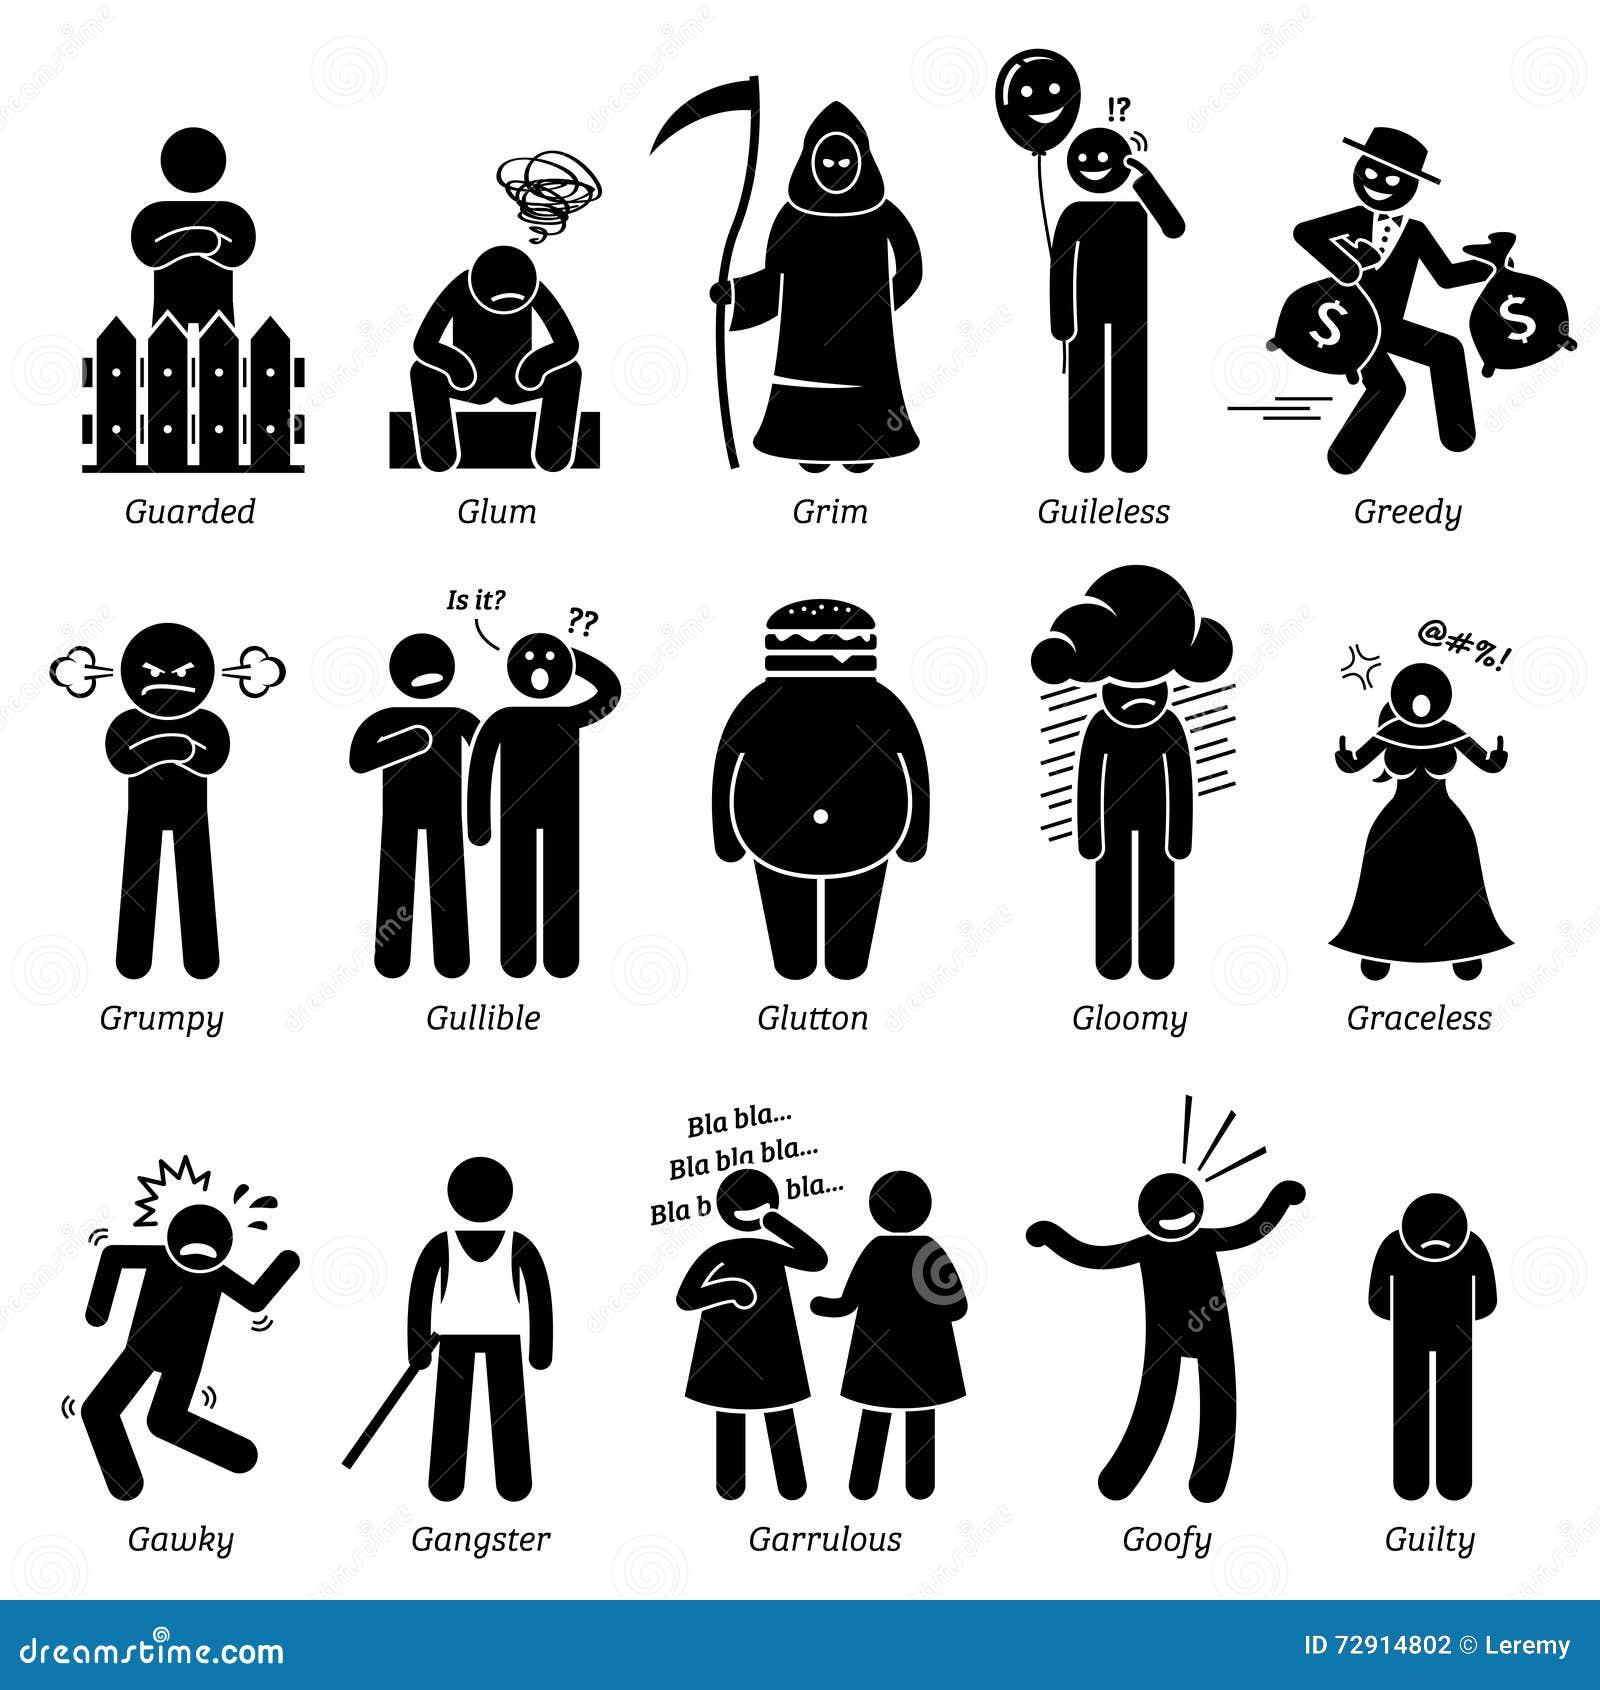 Traços de caráter negativos Clipart das personalidades